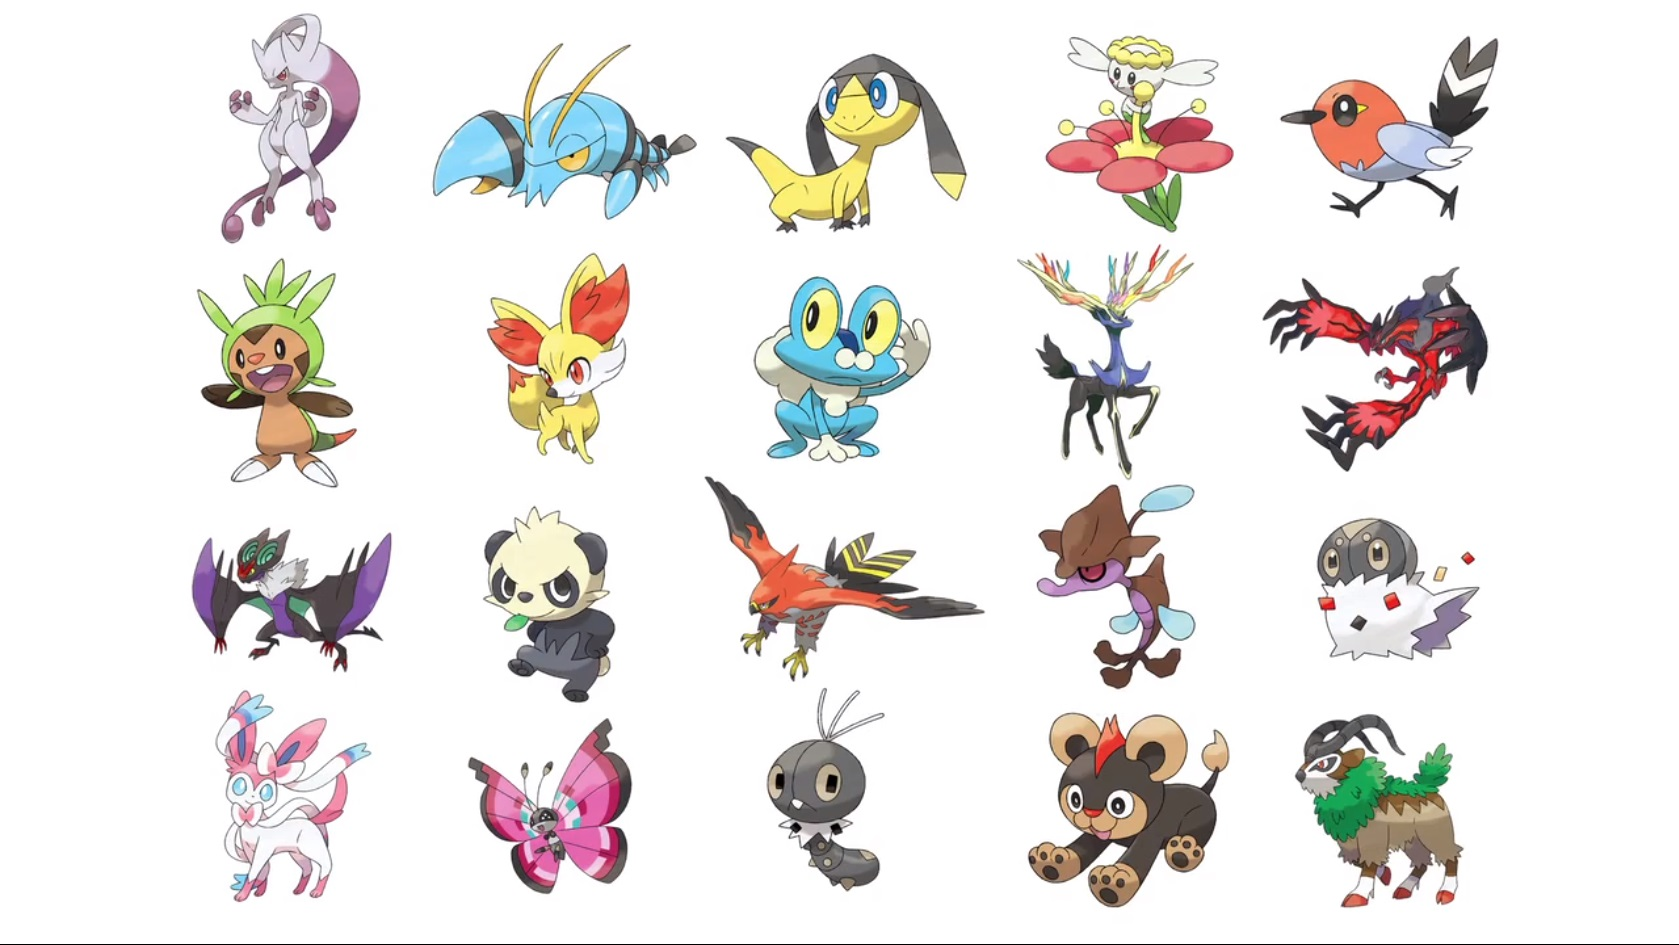 Pokemon Xy Zigzagoon 1 Free Hd Wallpaper